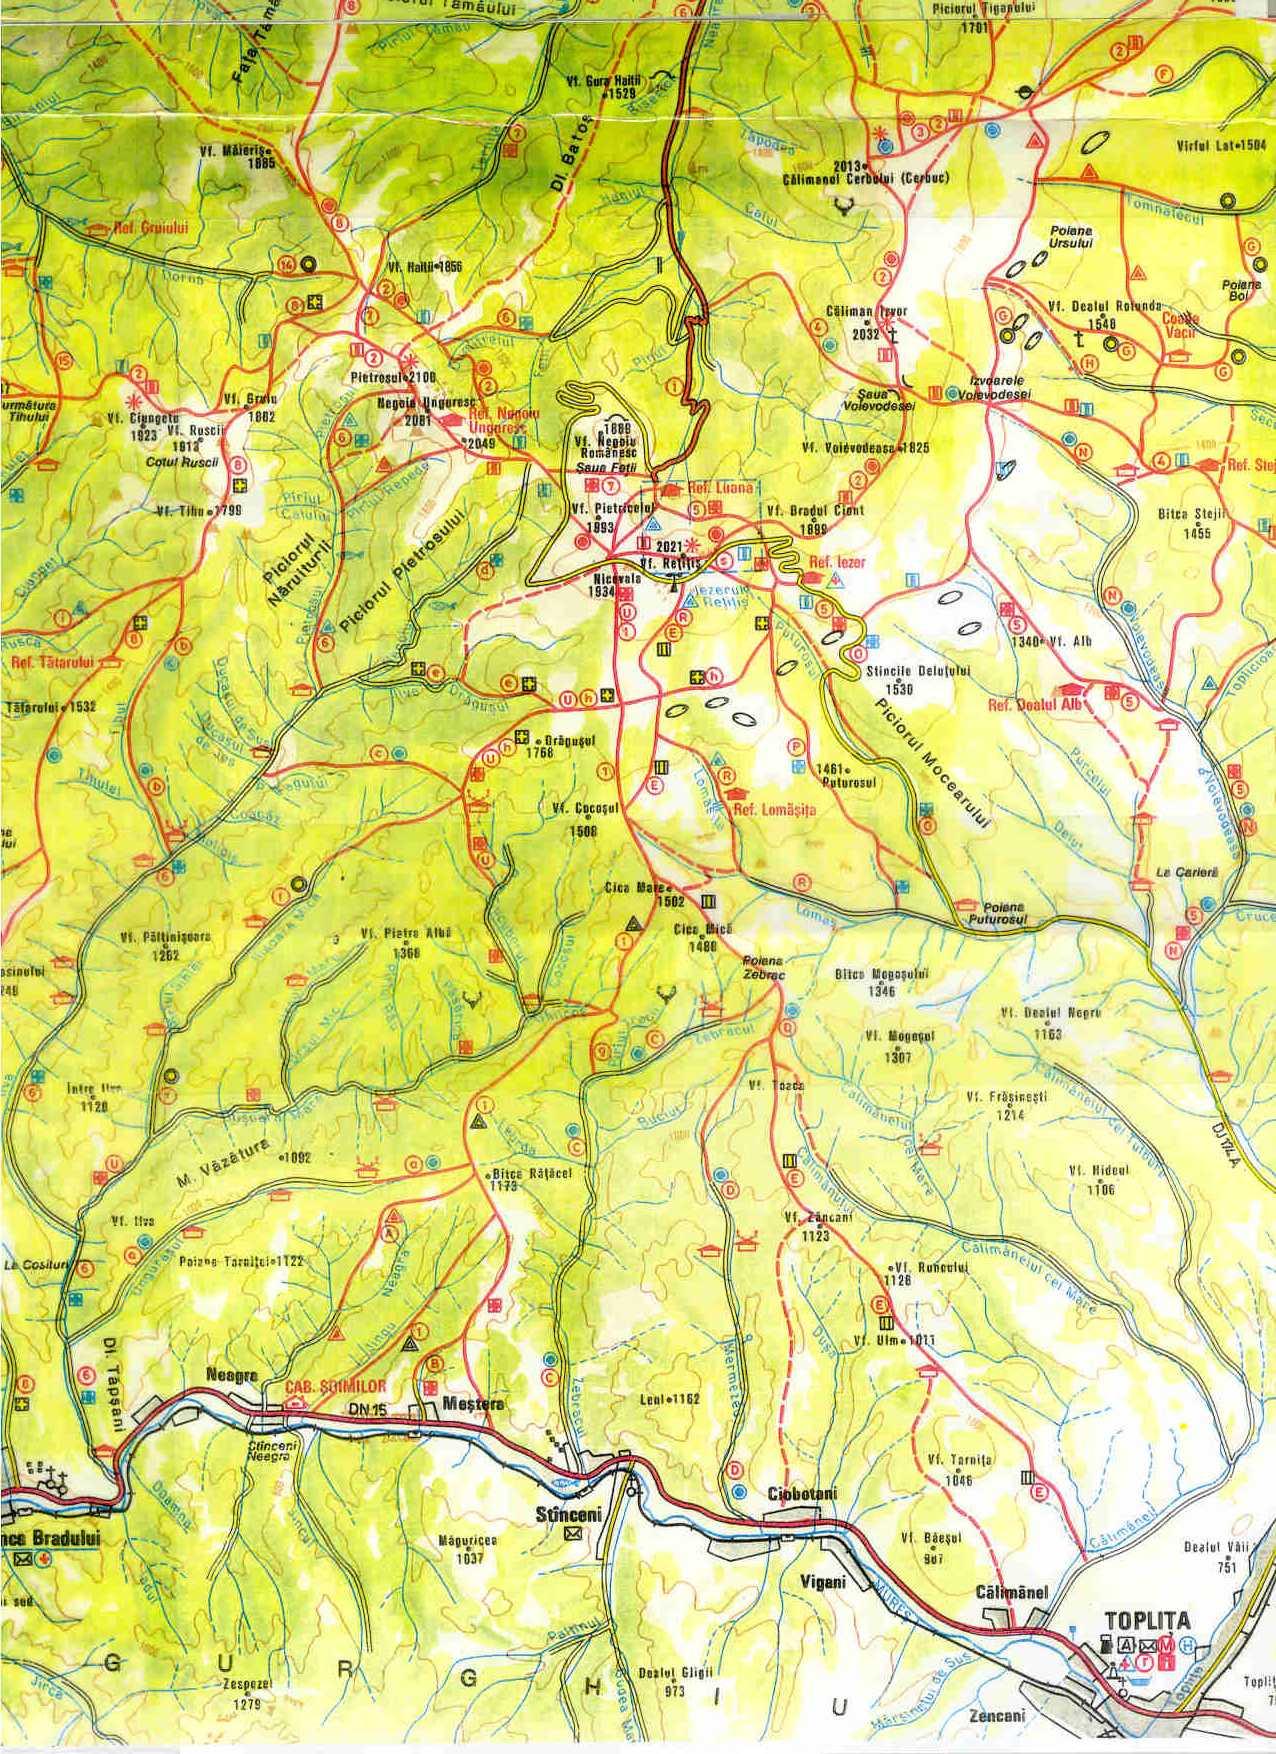 Harta Turistica A Muntilor Calimani Carpatii Orientali Profu